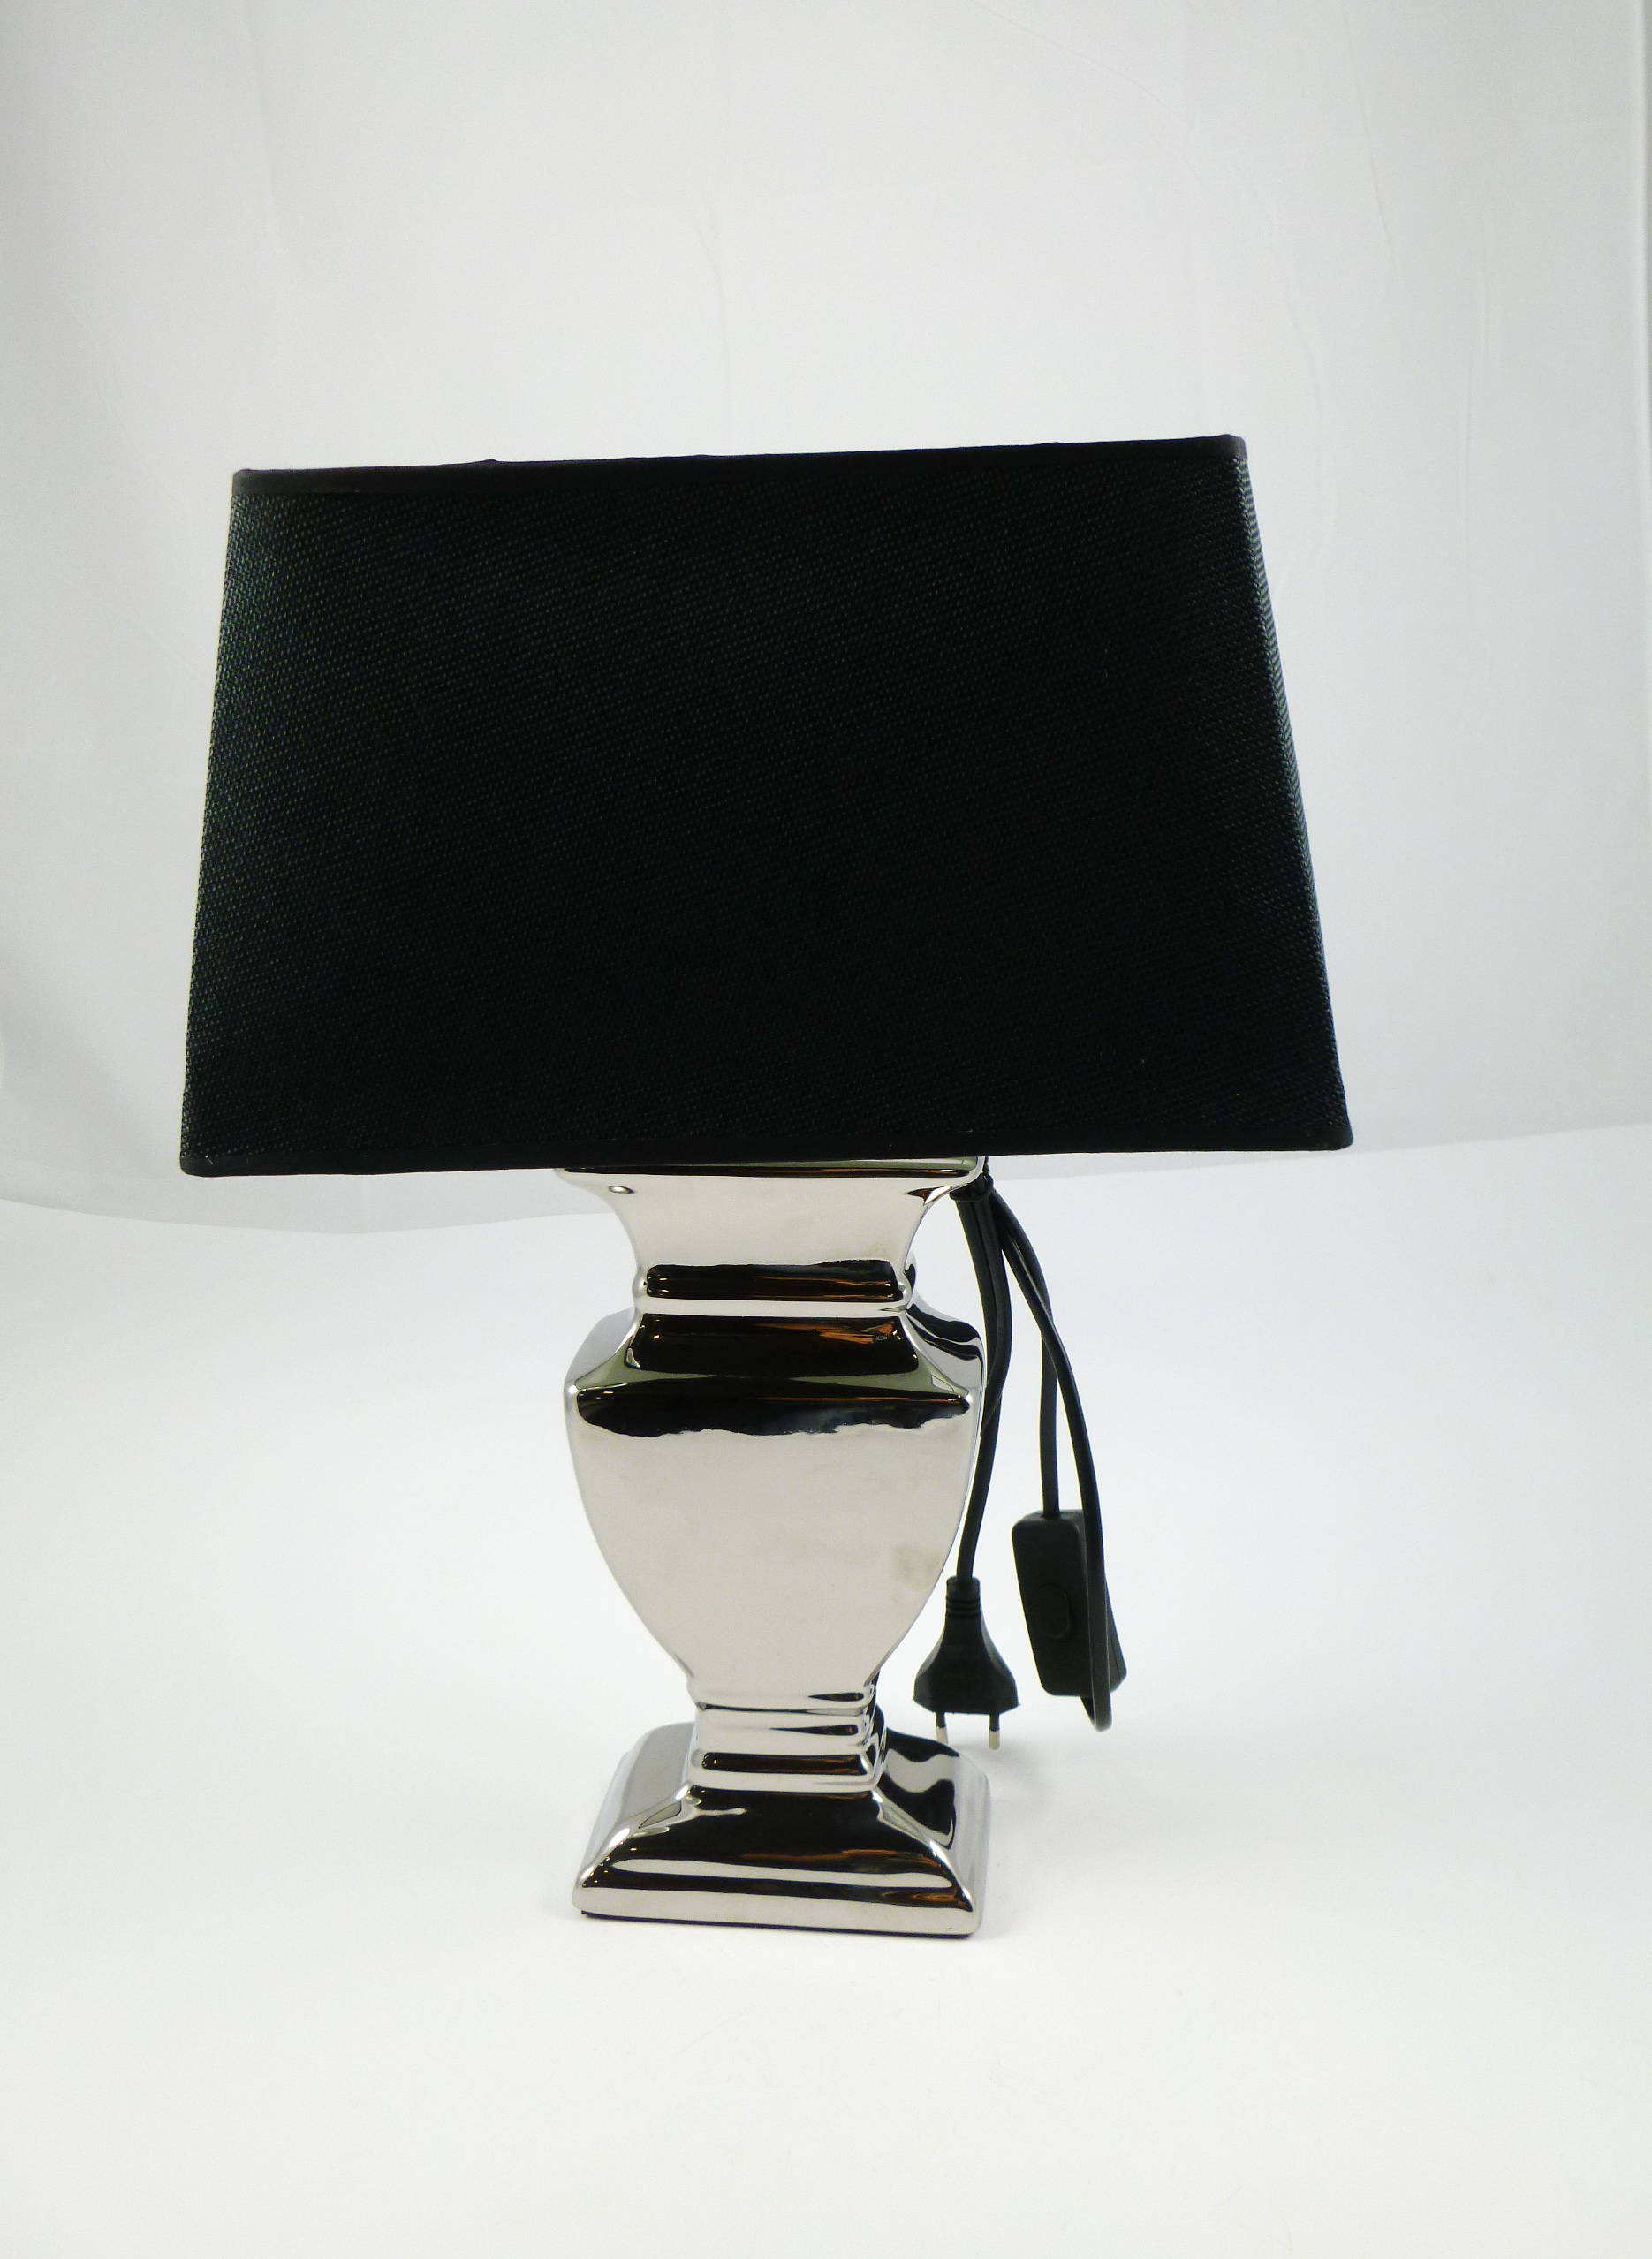 Lampe Malta eckig 16x9x39cm, 1 Stück